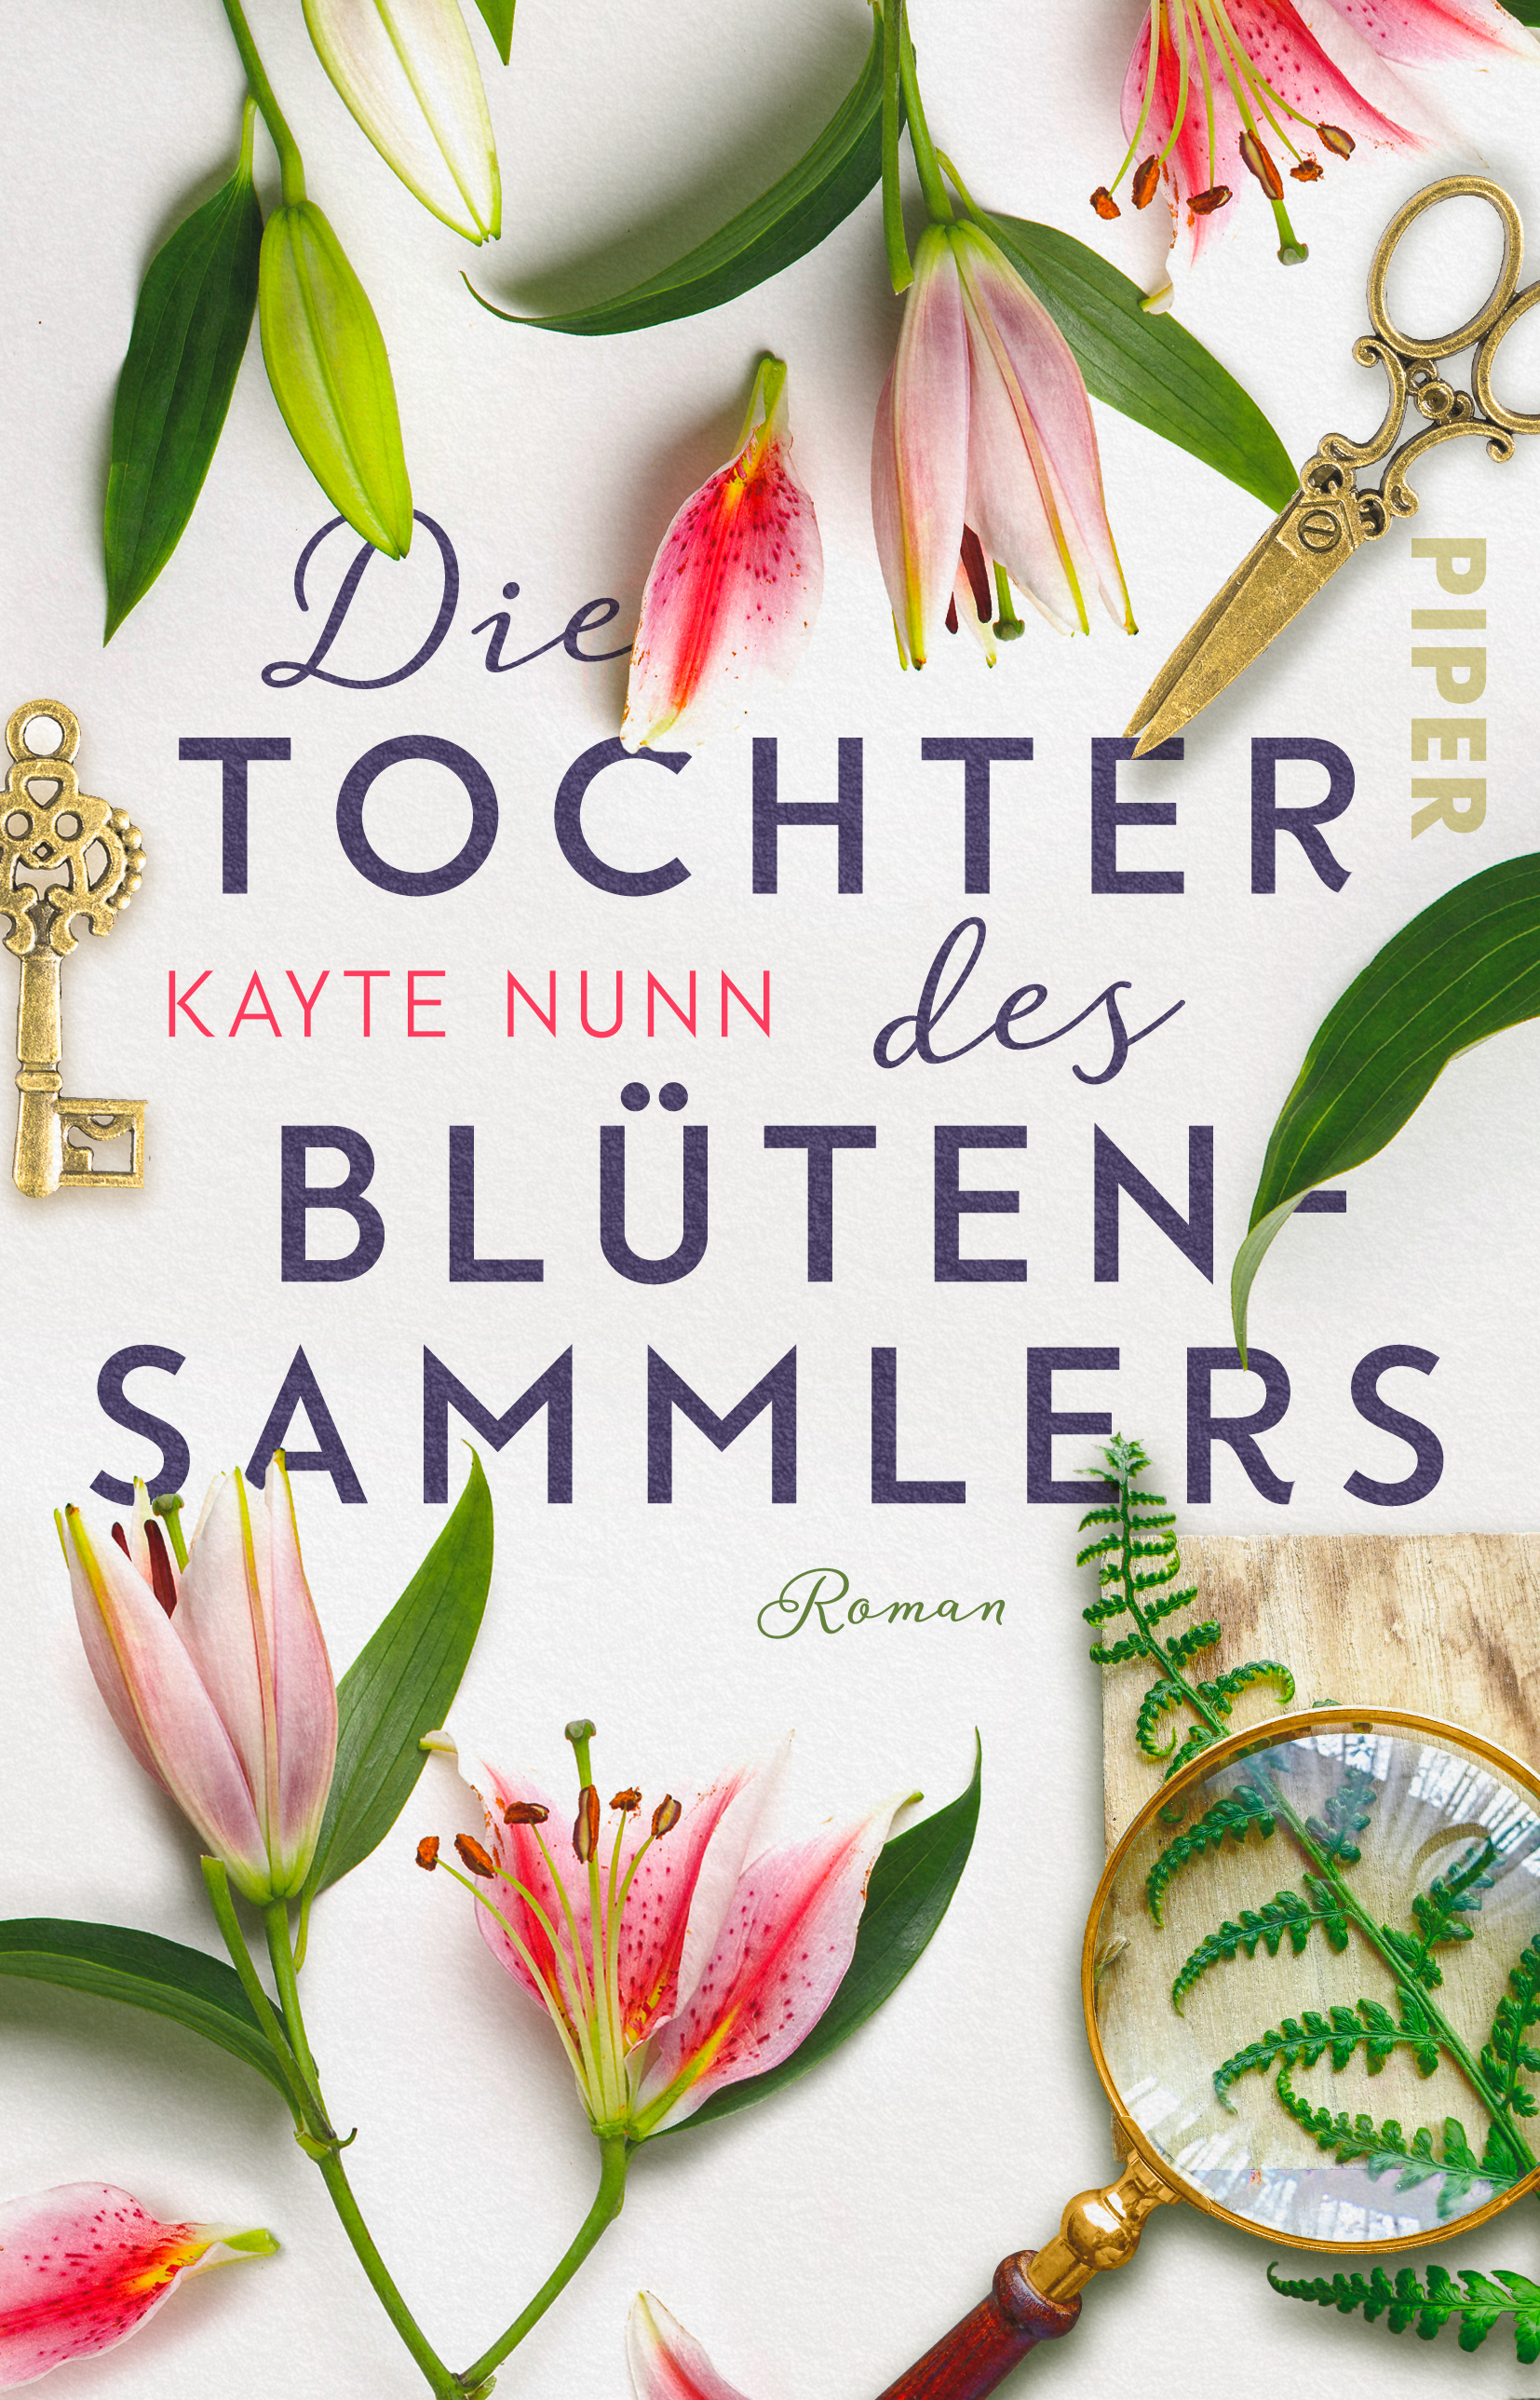 https://www.piper.de/buecher/die-tochter-des-bluetensammlers-isbn-978-3-492-22741-4